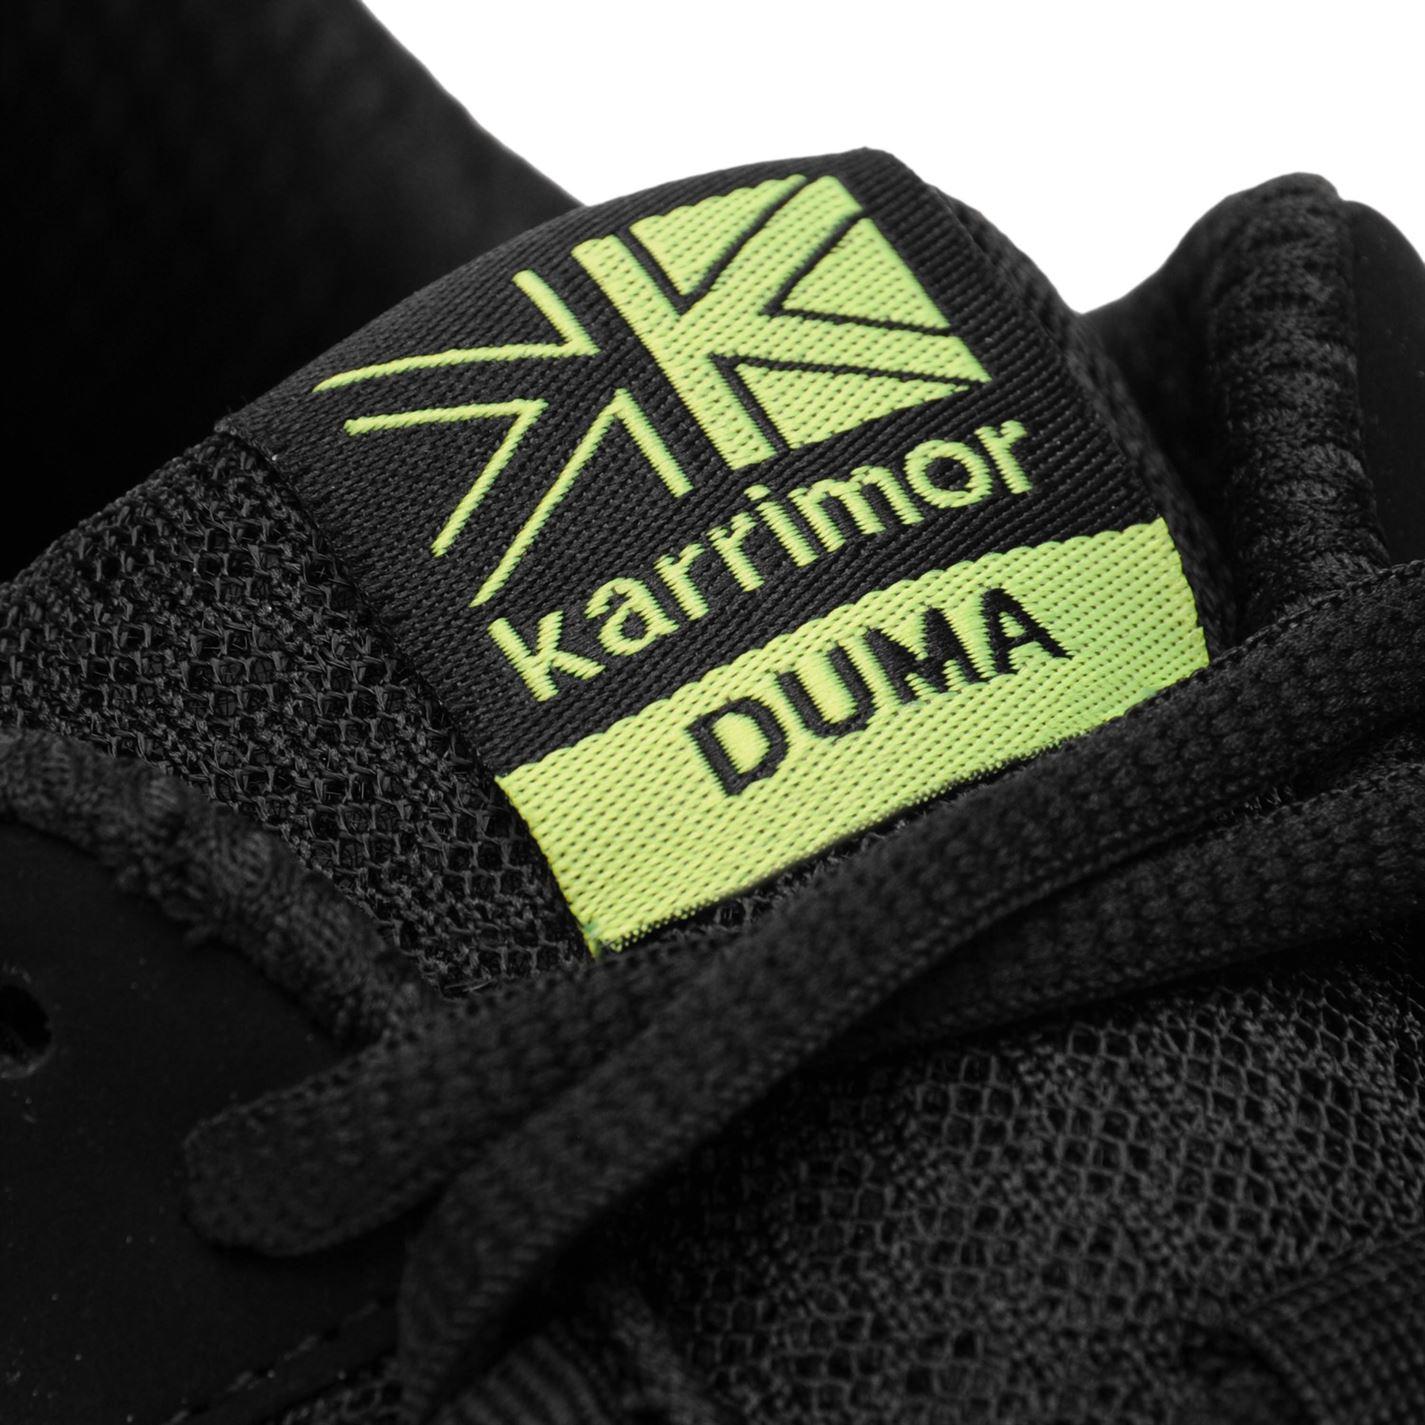 Karrimor-Mens-Duma-Trainers-Lace-Up-Sports-Running-Cross-Training-Shoes thumbnail 31